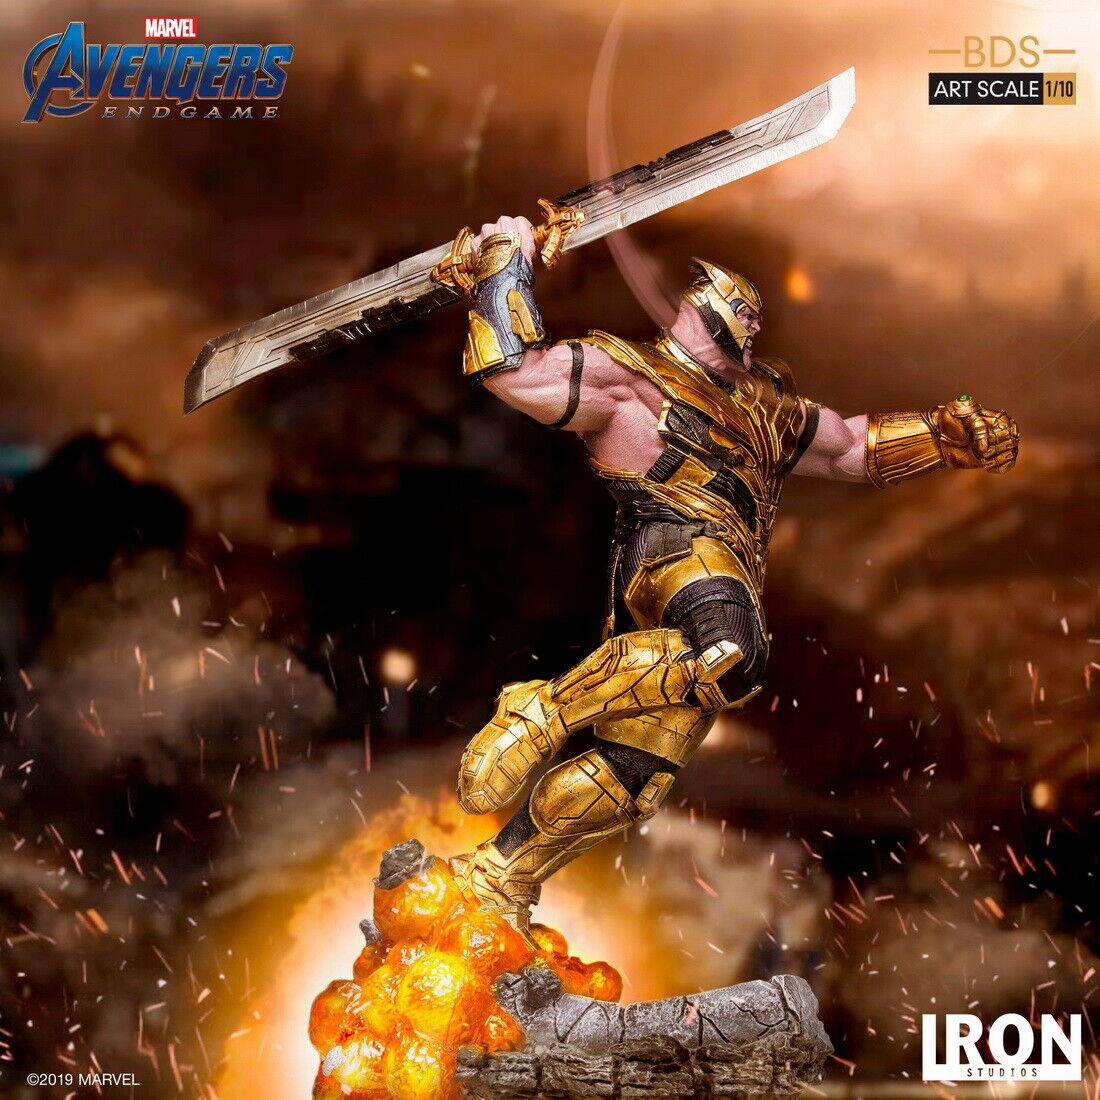 Iron Studios 1 10 Avengers Endgame Thanos Thanos Thanos Figure Statue Art Scale Standard Ver. c45606